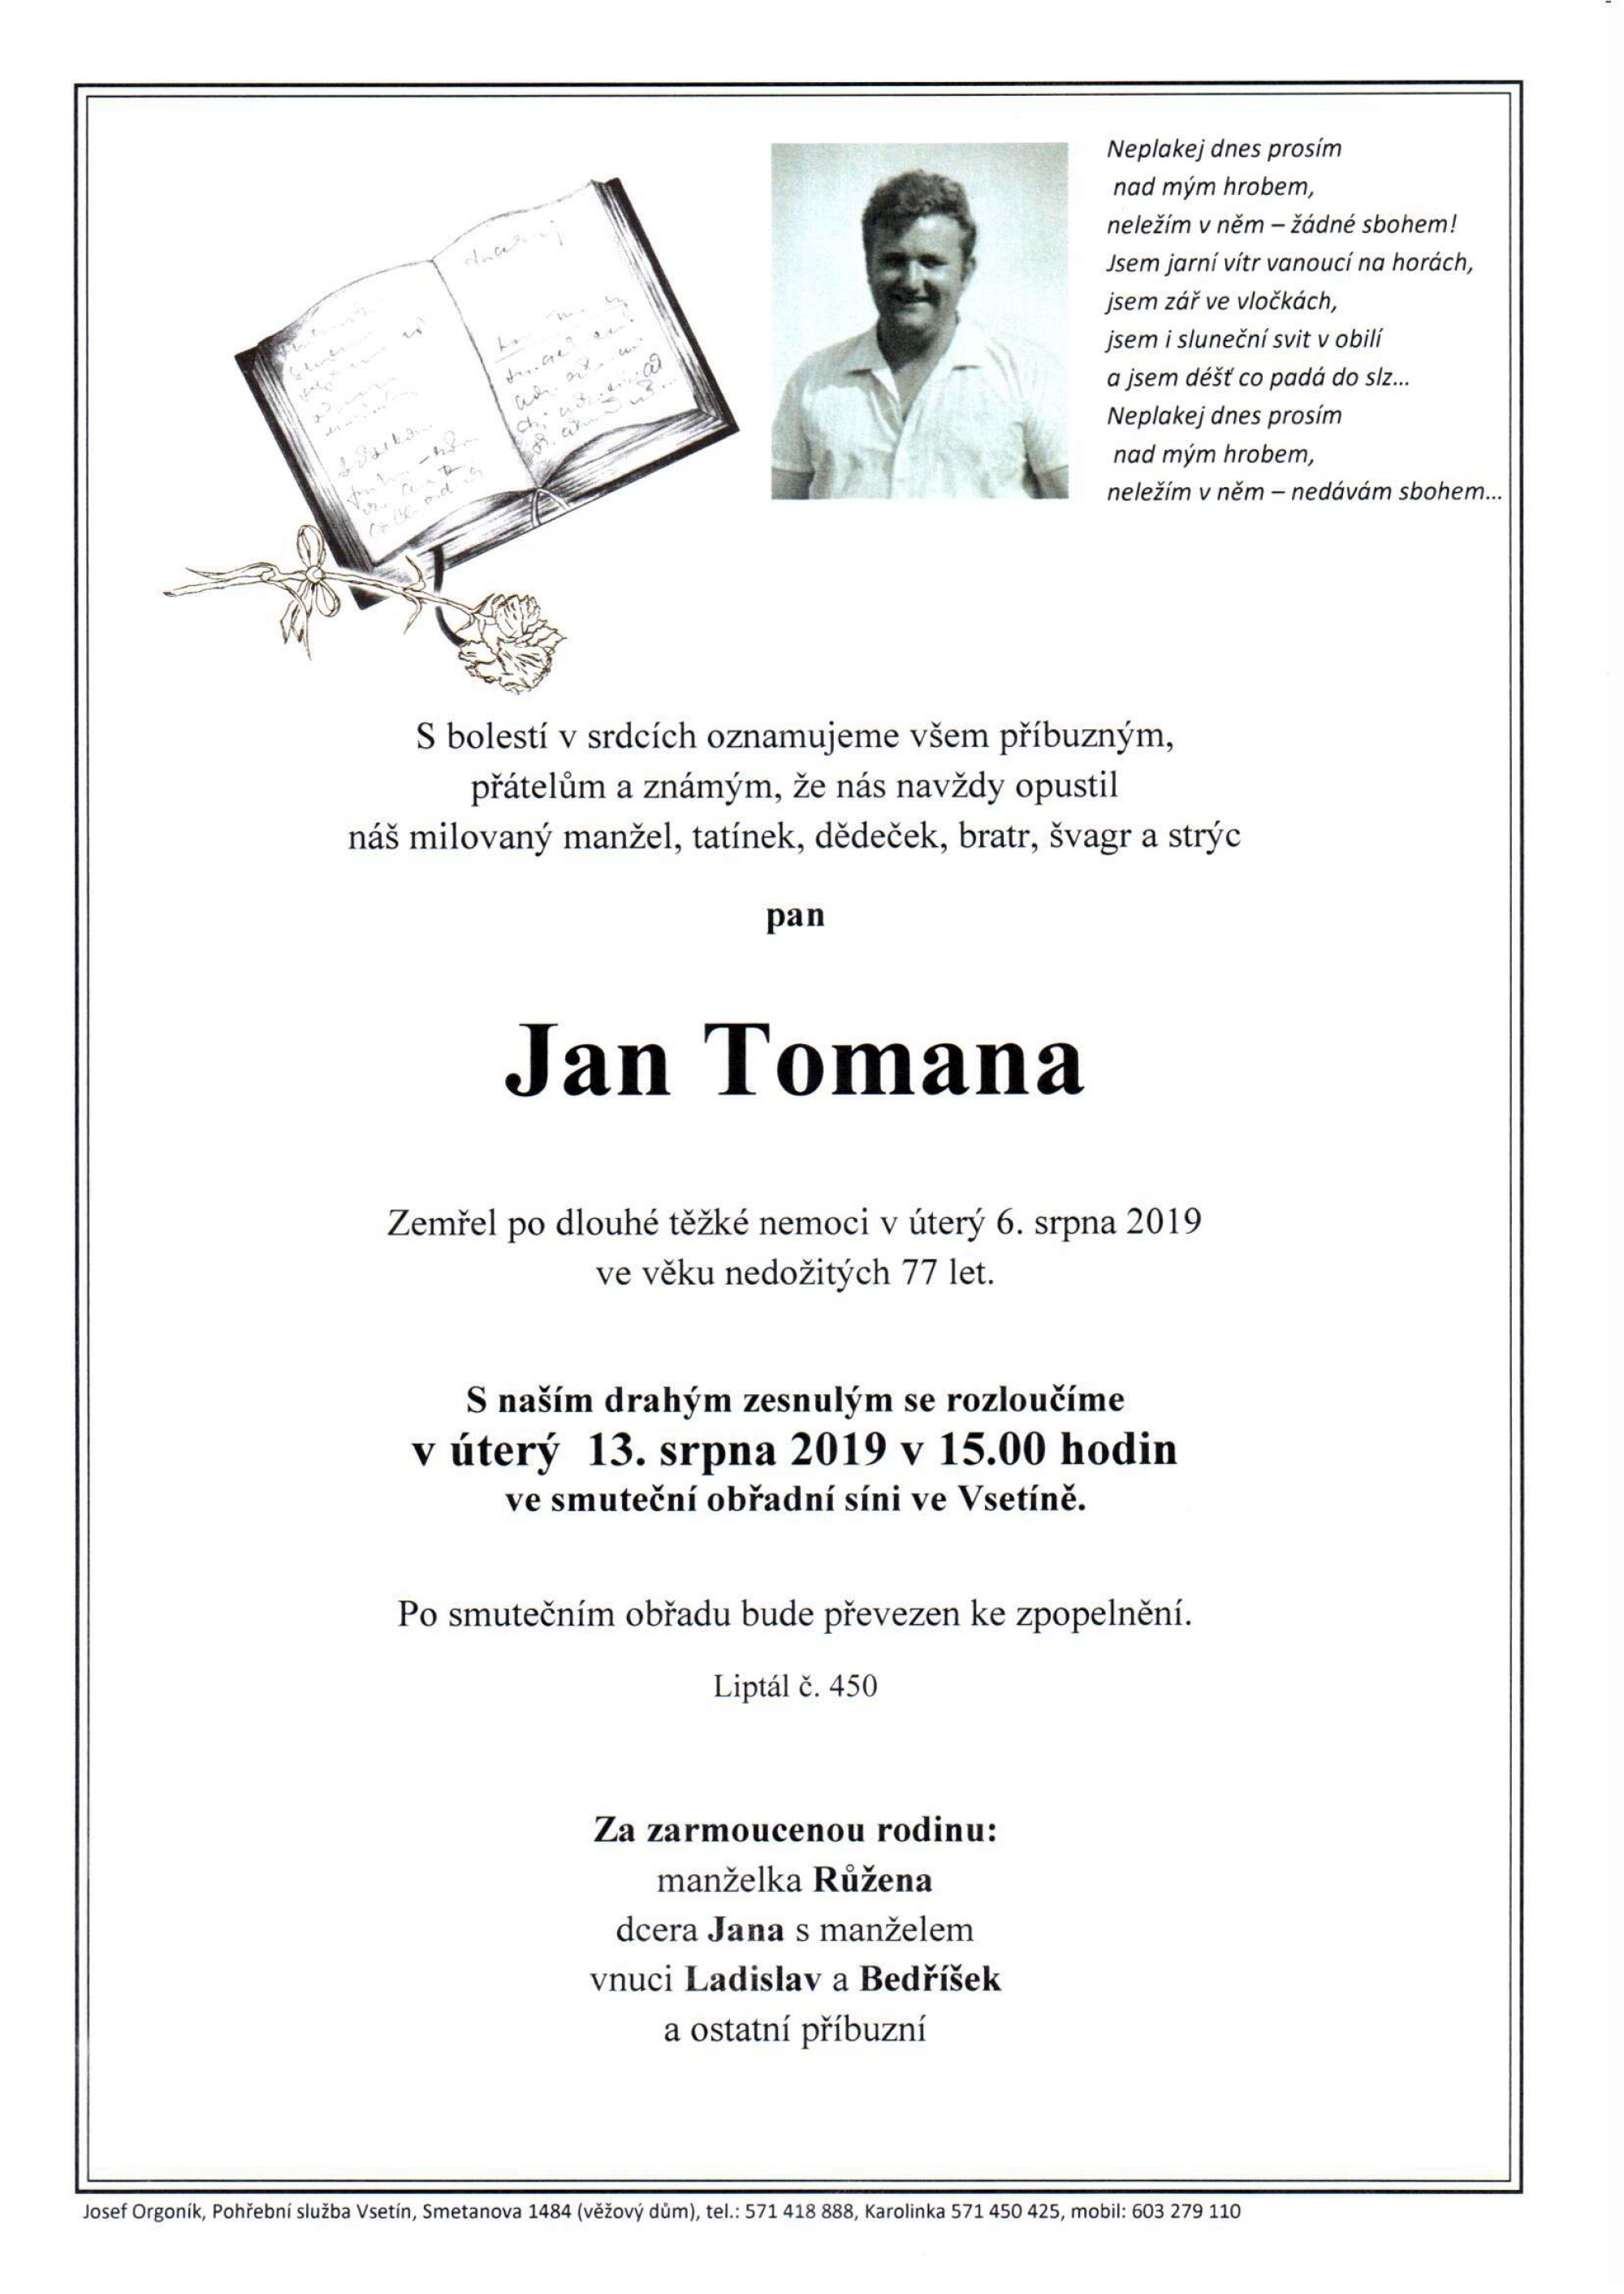 Jan Tomana